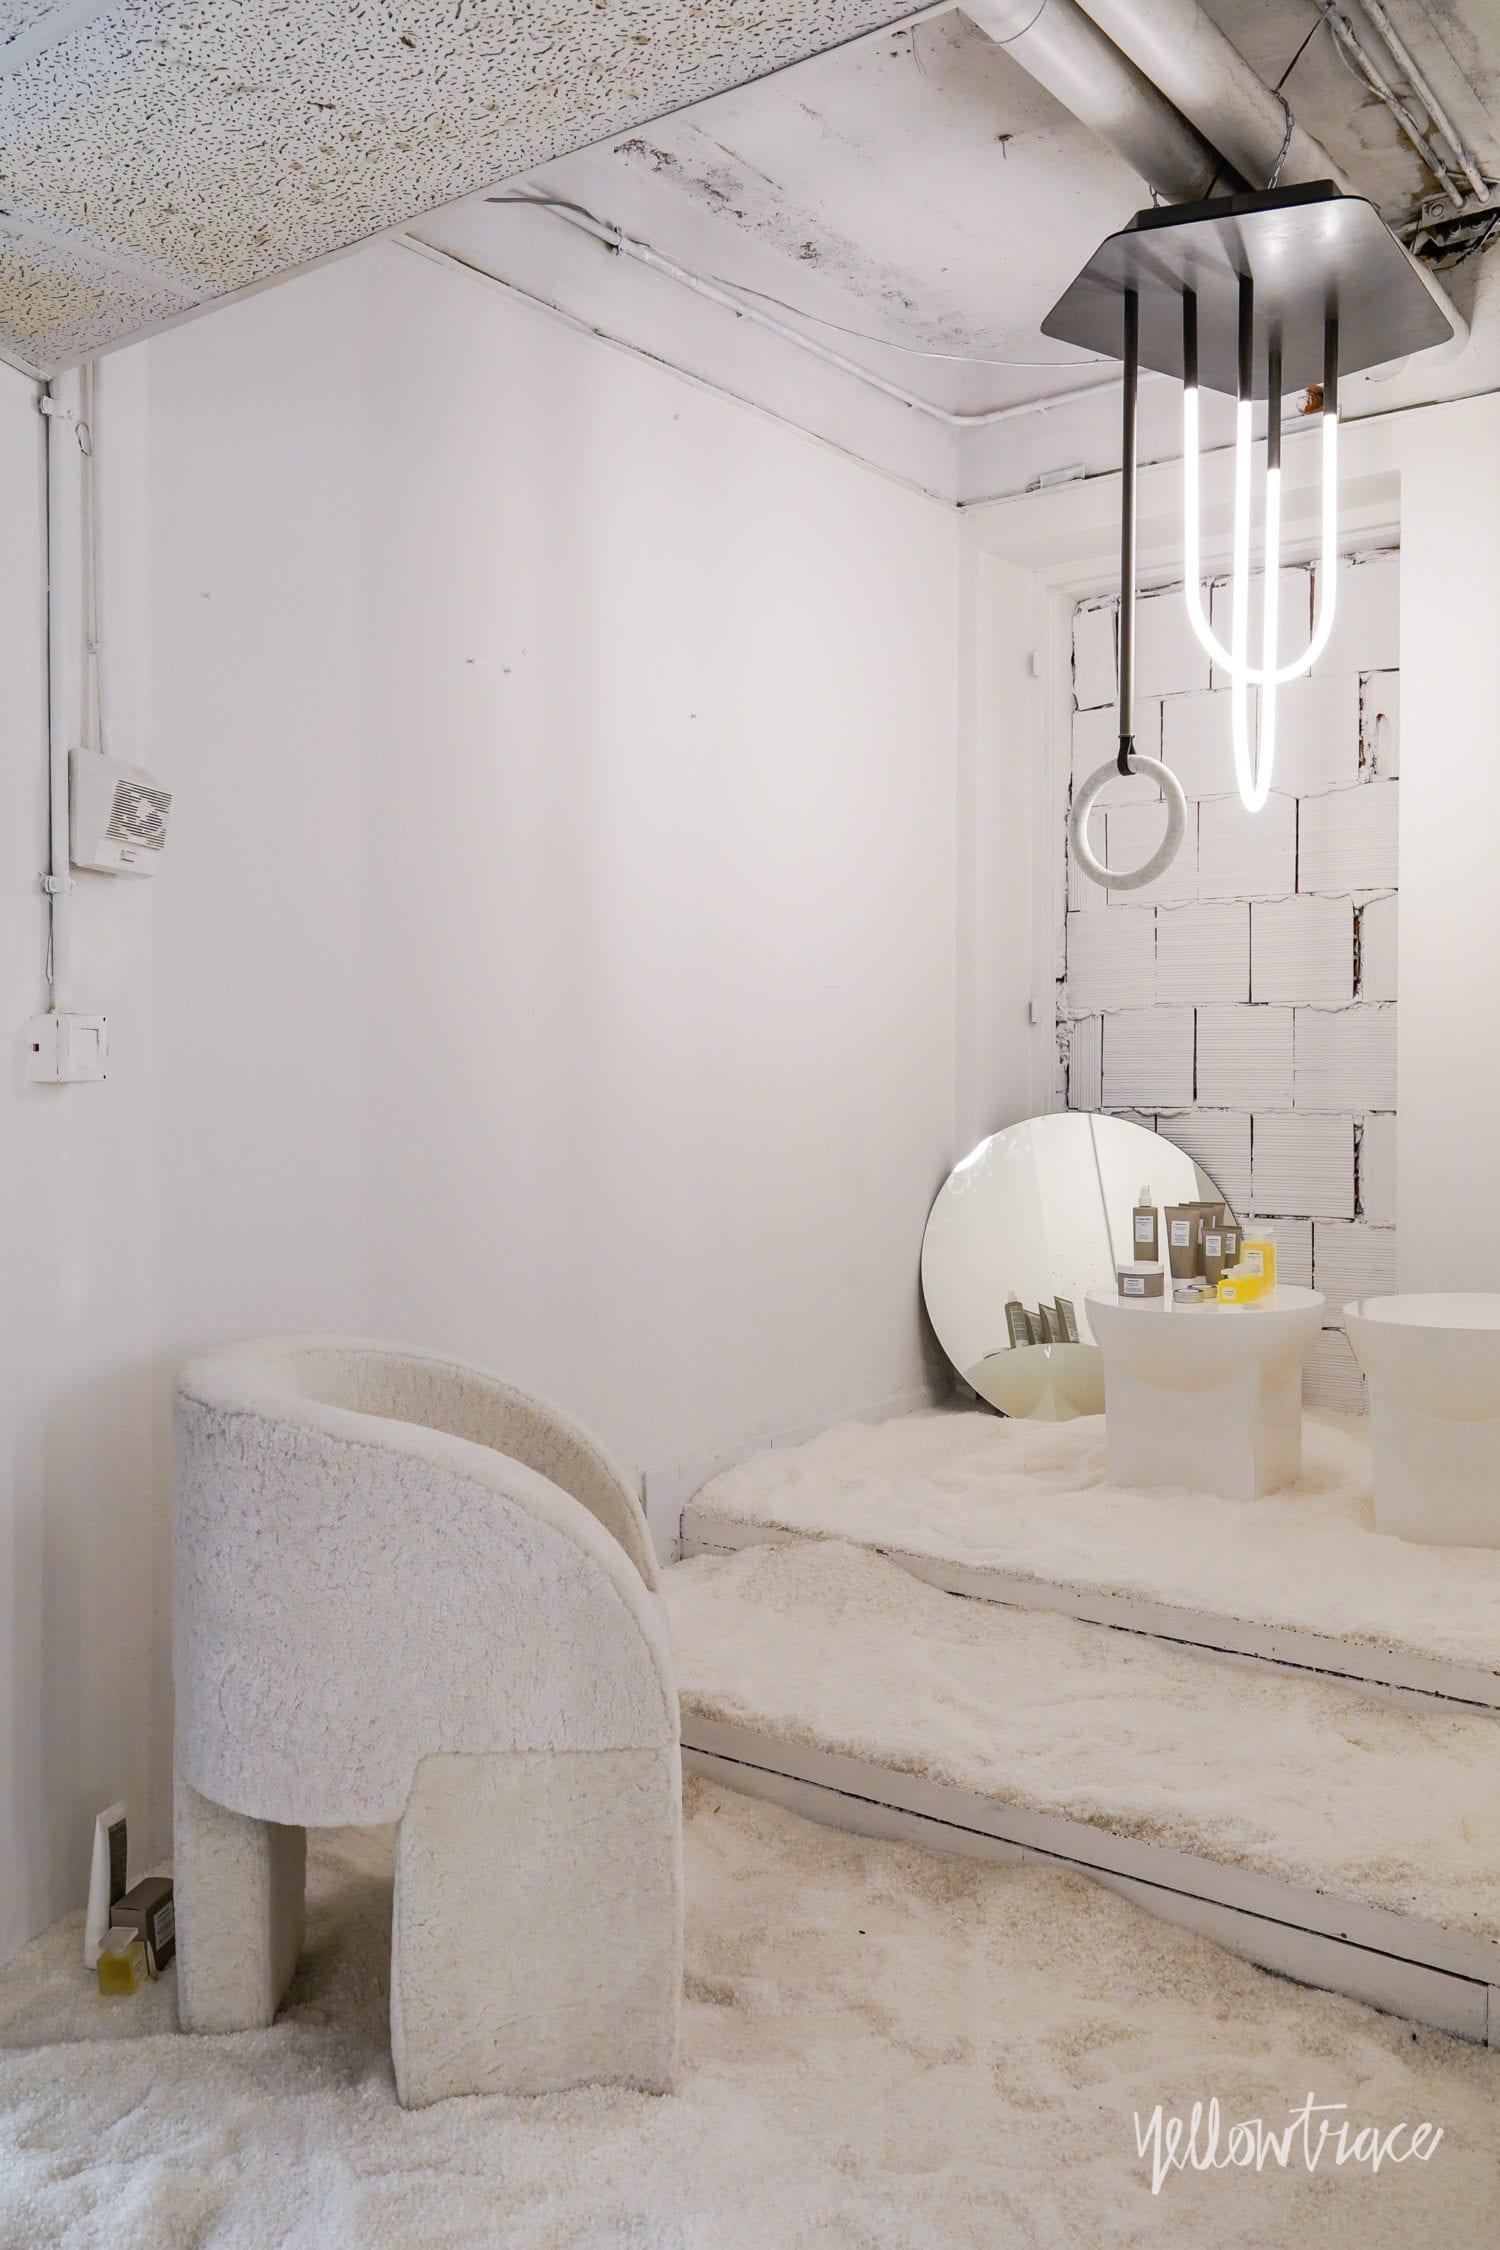 Les Arcanistes Studiopepe At Milan Design Week 2019 Photo Nick Hughes Yellowtrace 42